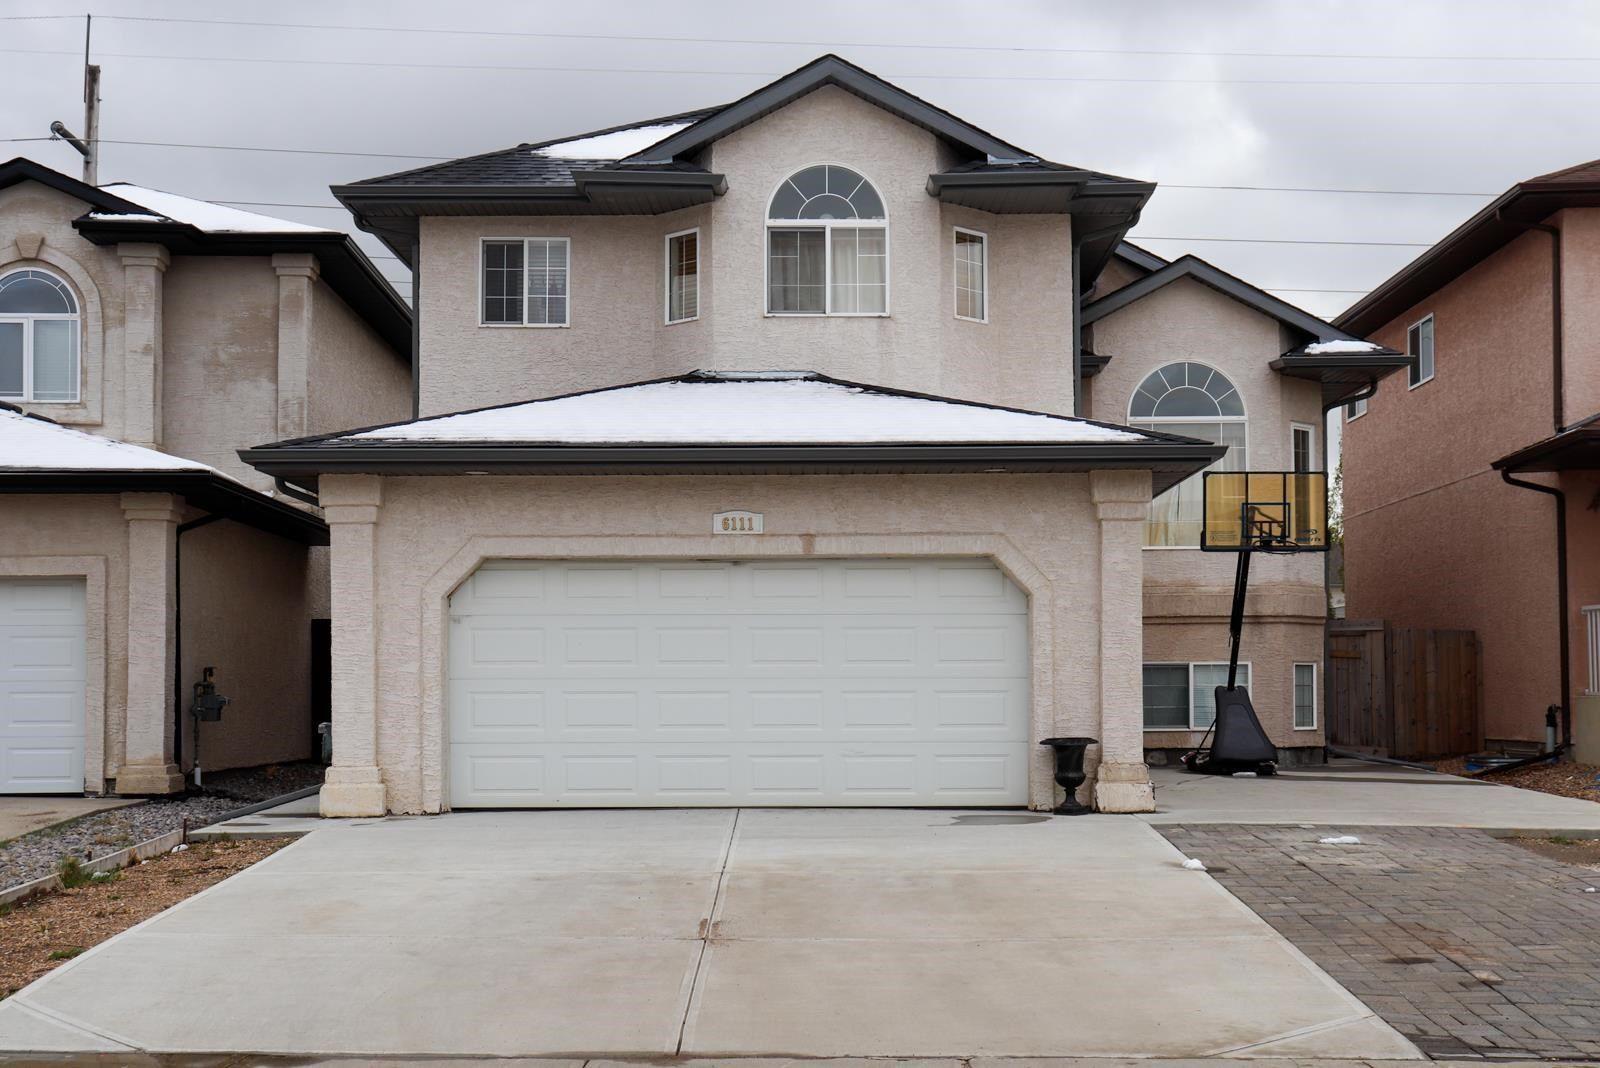 Main Photo: 6111 164 Avenue in Edmonton: Zone 03 House for sale : MLS®# E4244949